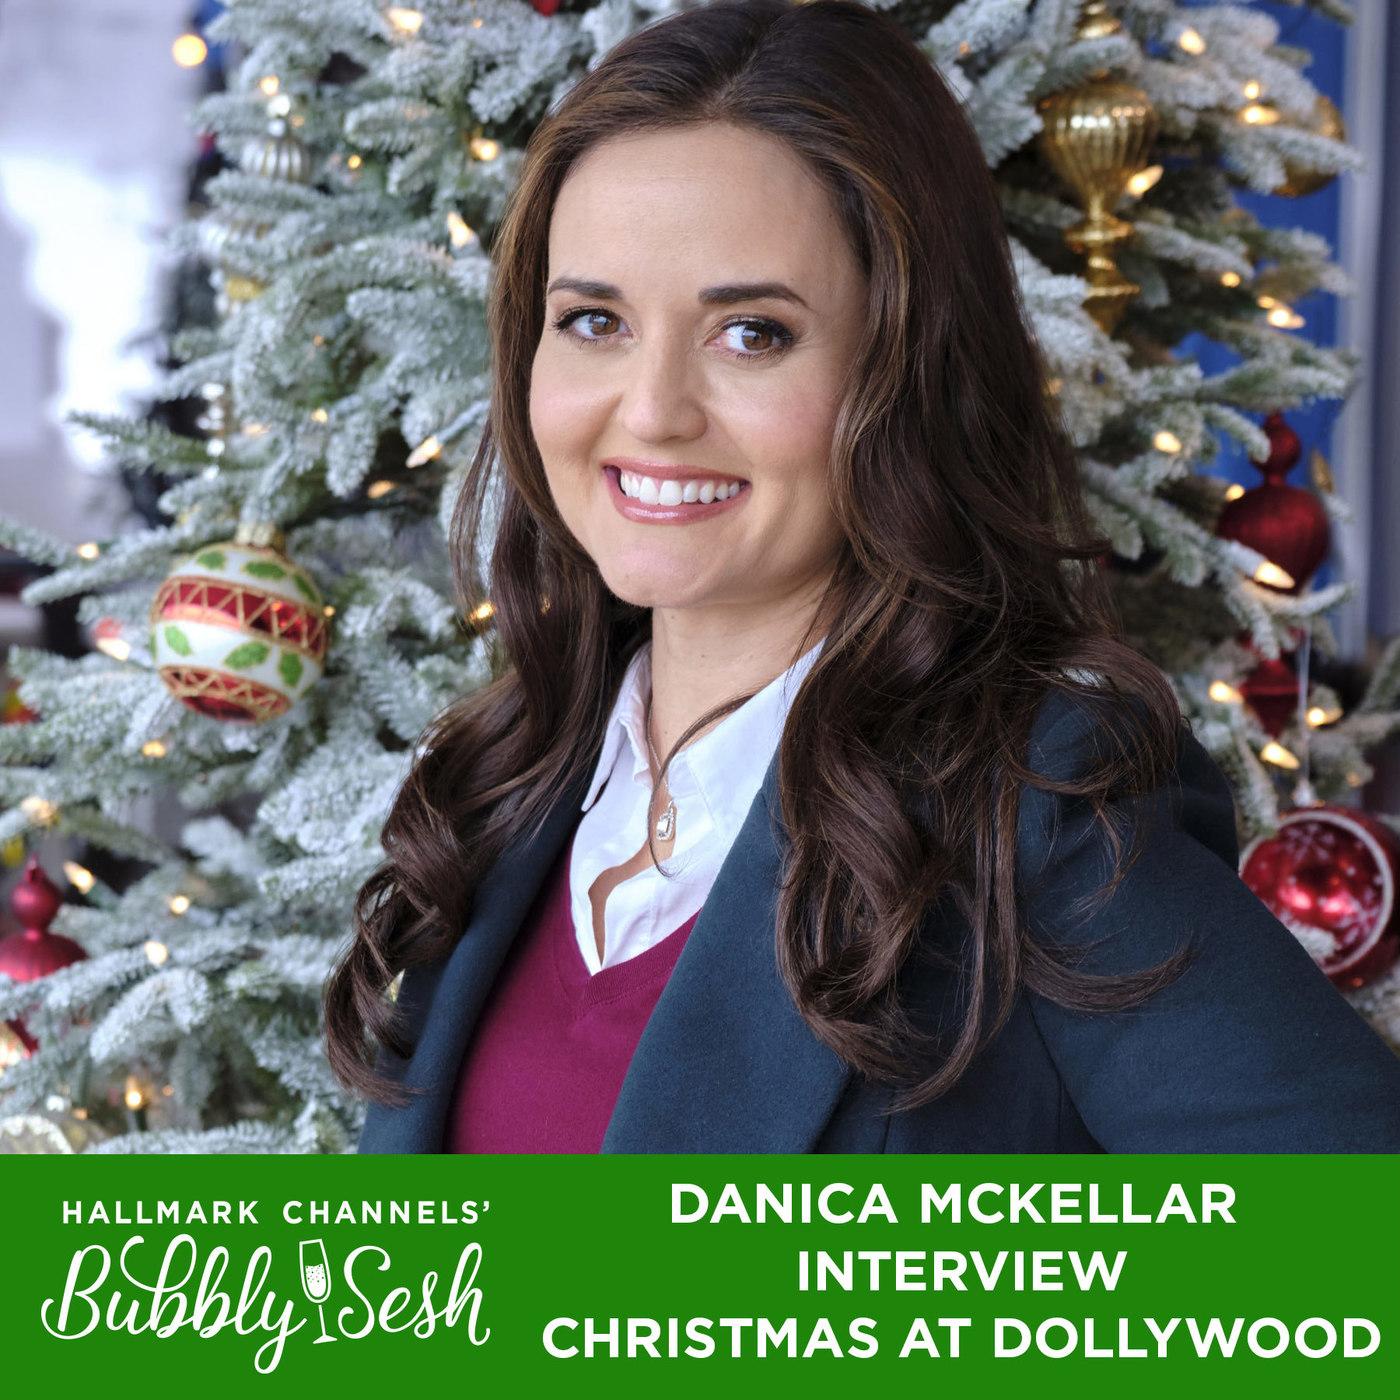 Danica McKellar Interview, Christmas At Dollywood